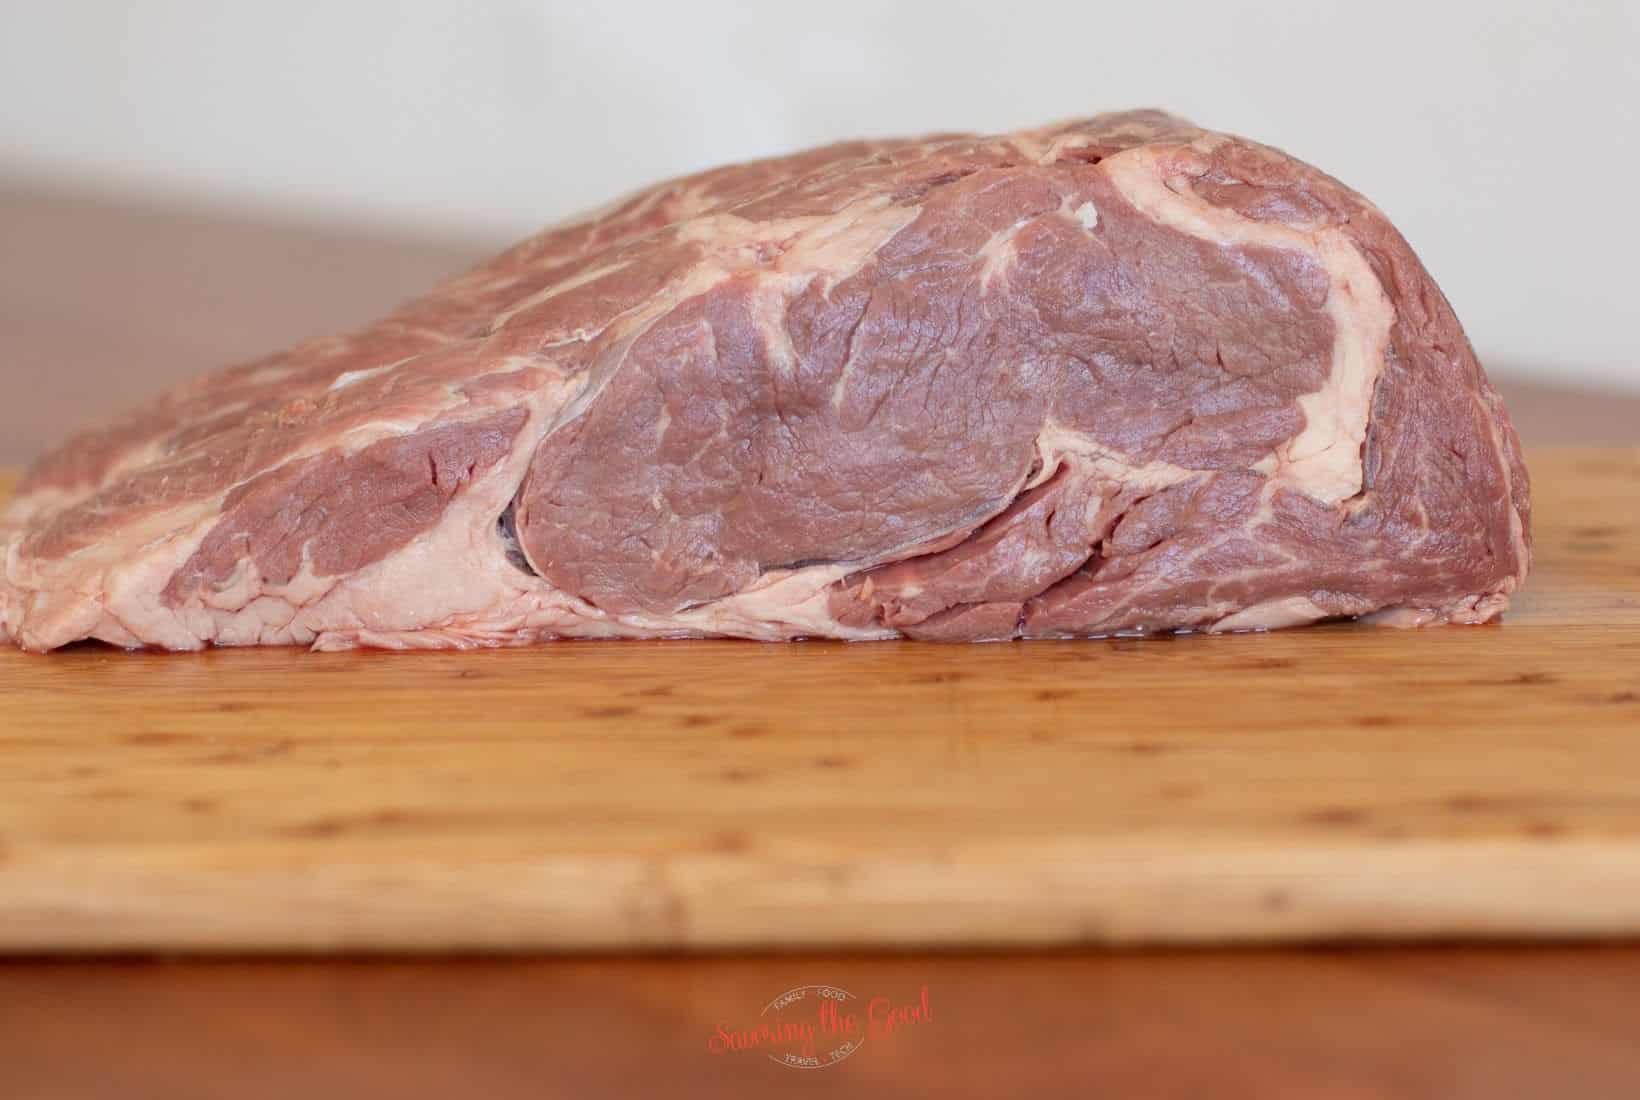 boneless rib roast on a cutting board